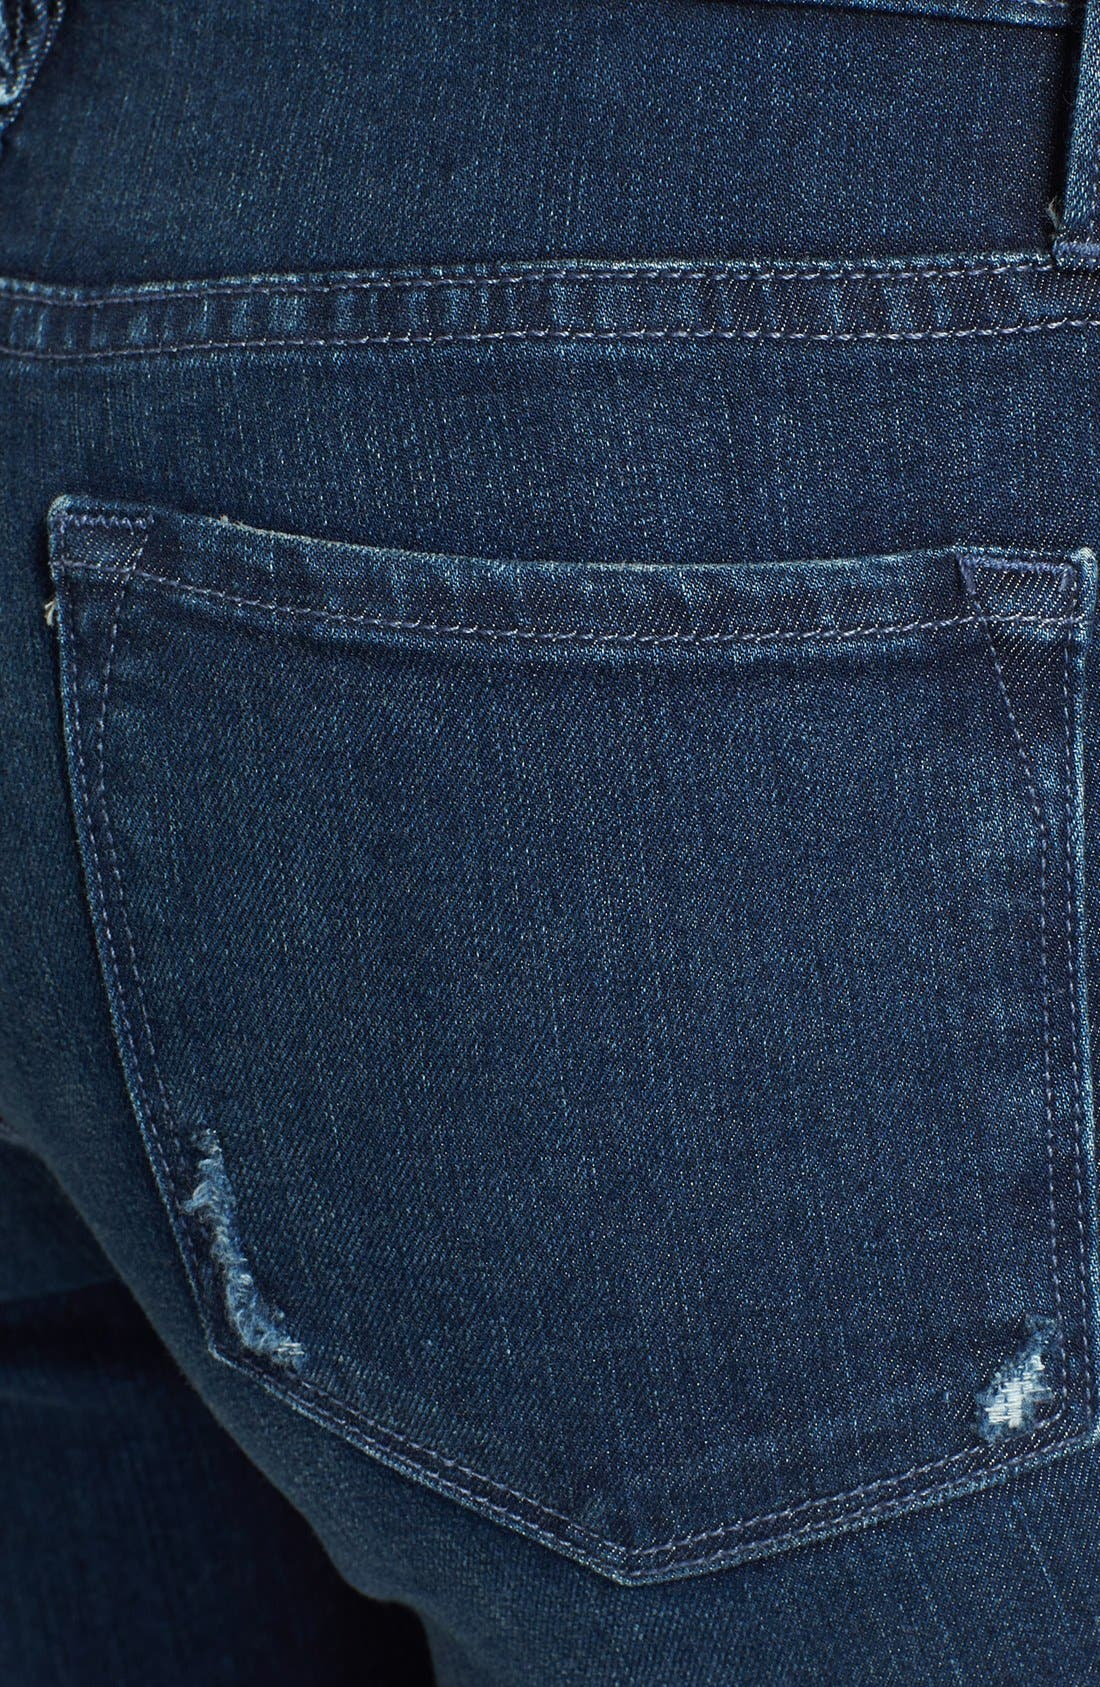 Alternate Image 3  - Frame Denim 'Le Skinny de Jeanne' Jeans (Runyon Canyon)